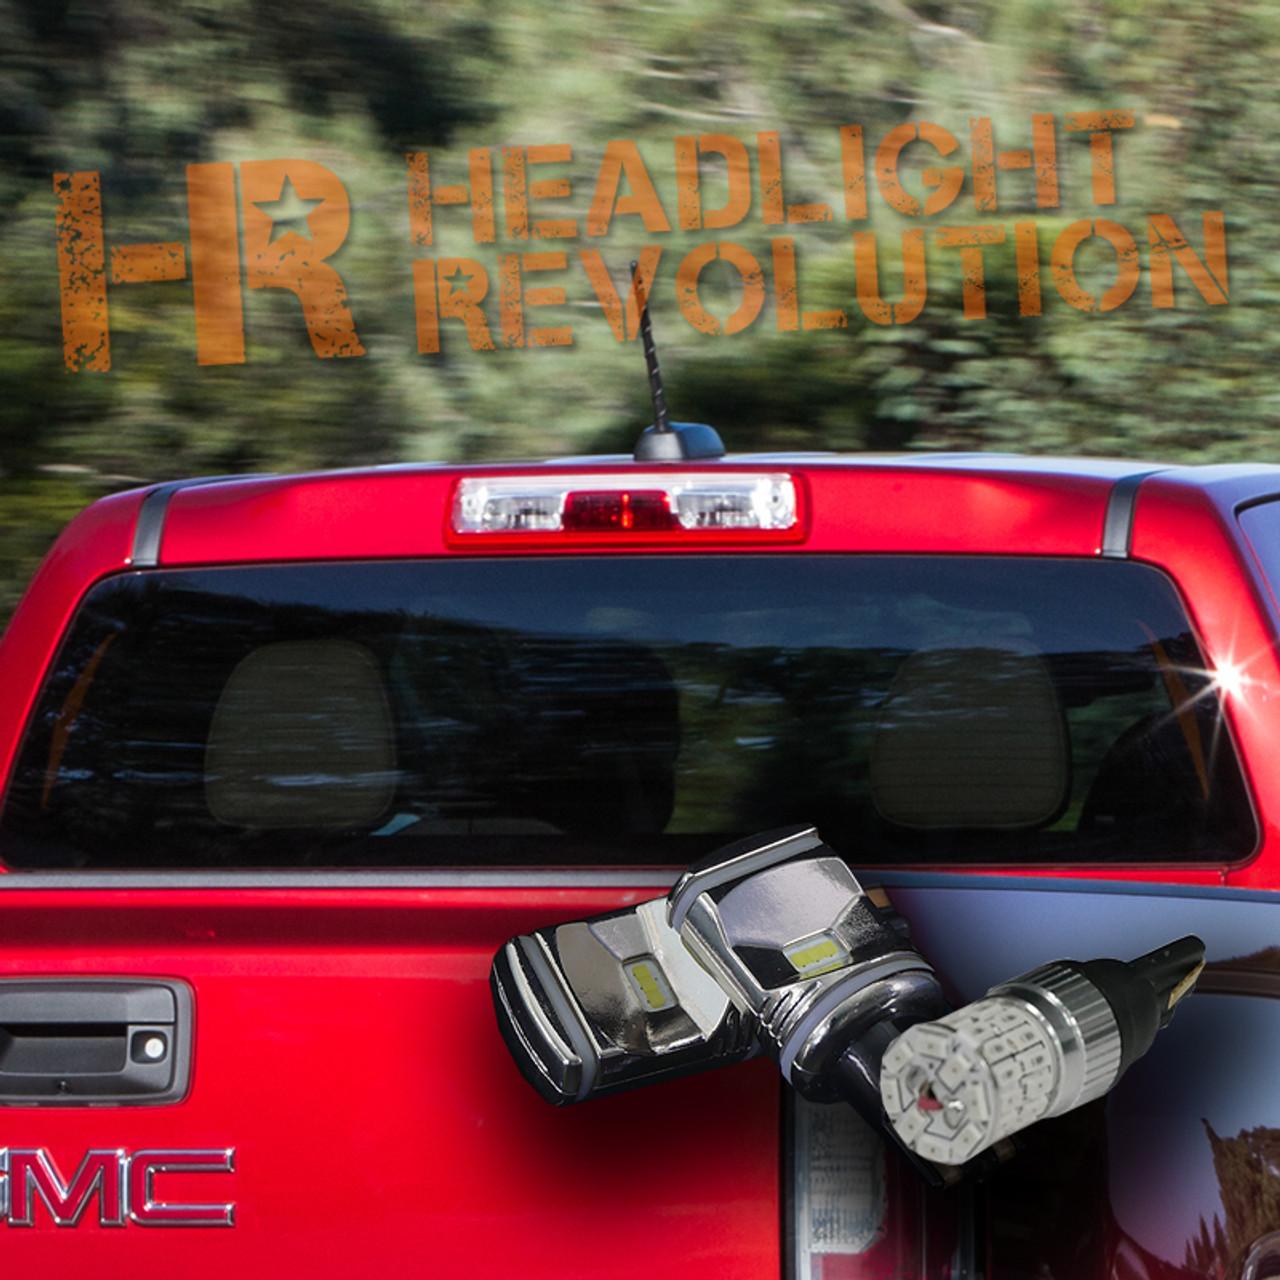 2015 2018 Gmc Canyon Canyon Denali Led Cargo And 3rd Brake Light Kit Headlight Revolution